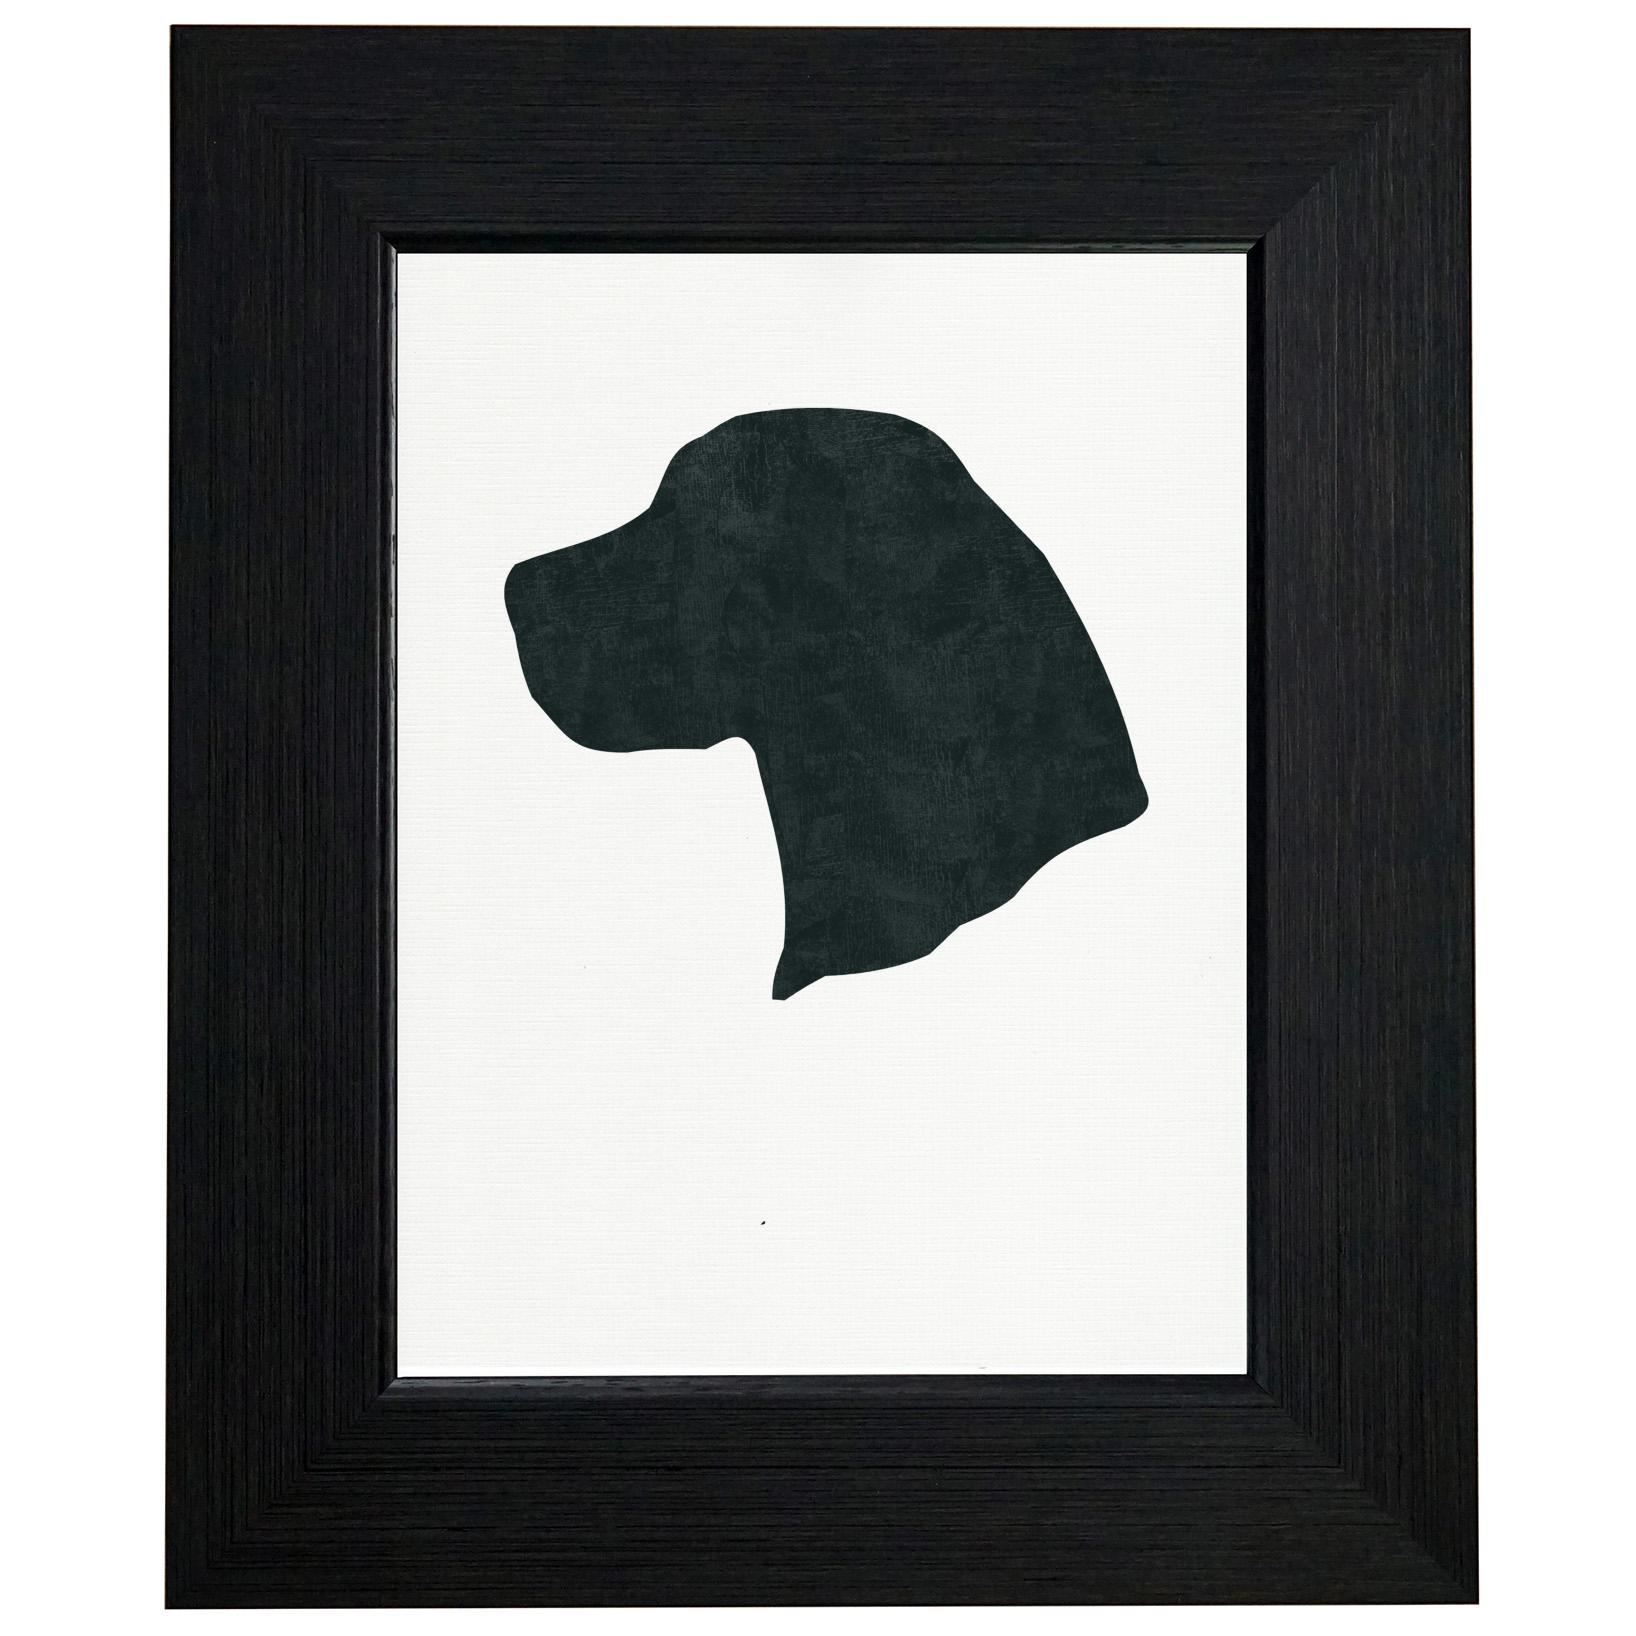 Beagle Dog Head Framed Print Poster Wall or Desk Mount Options